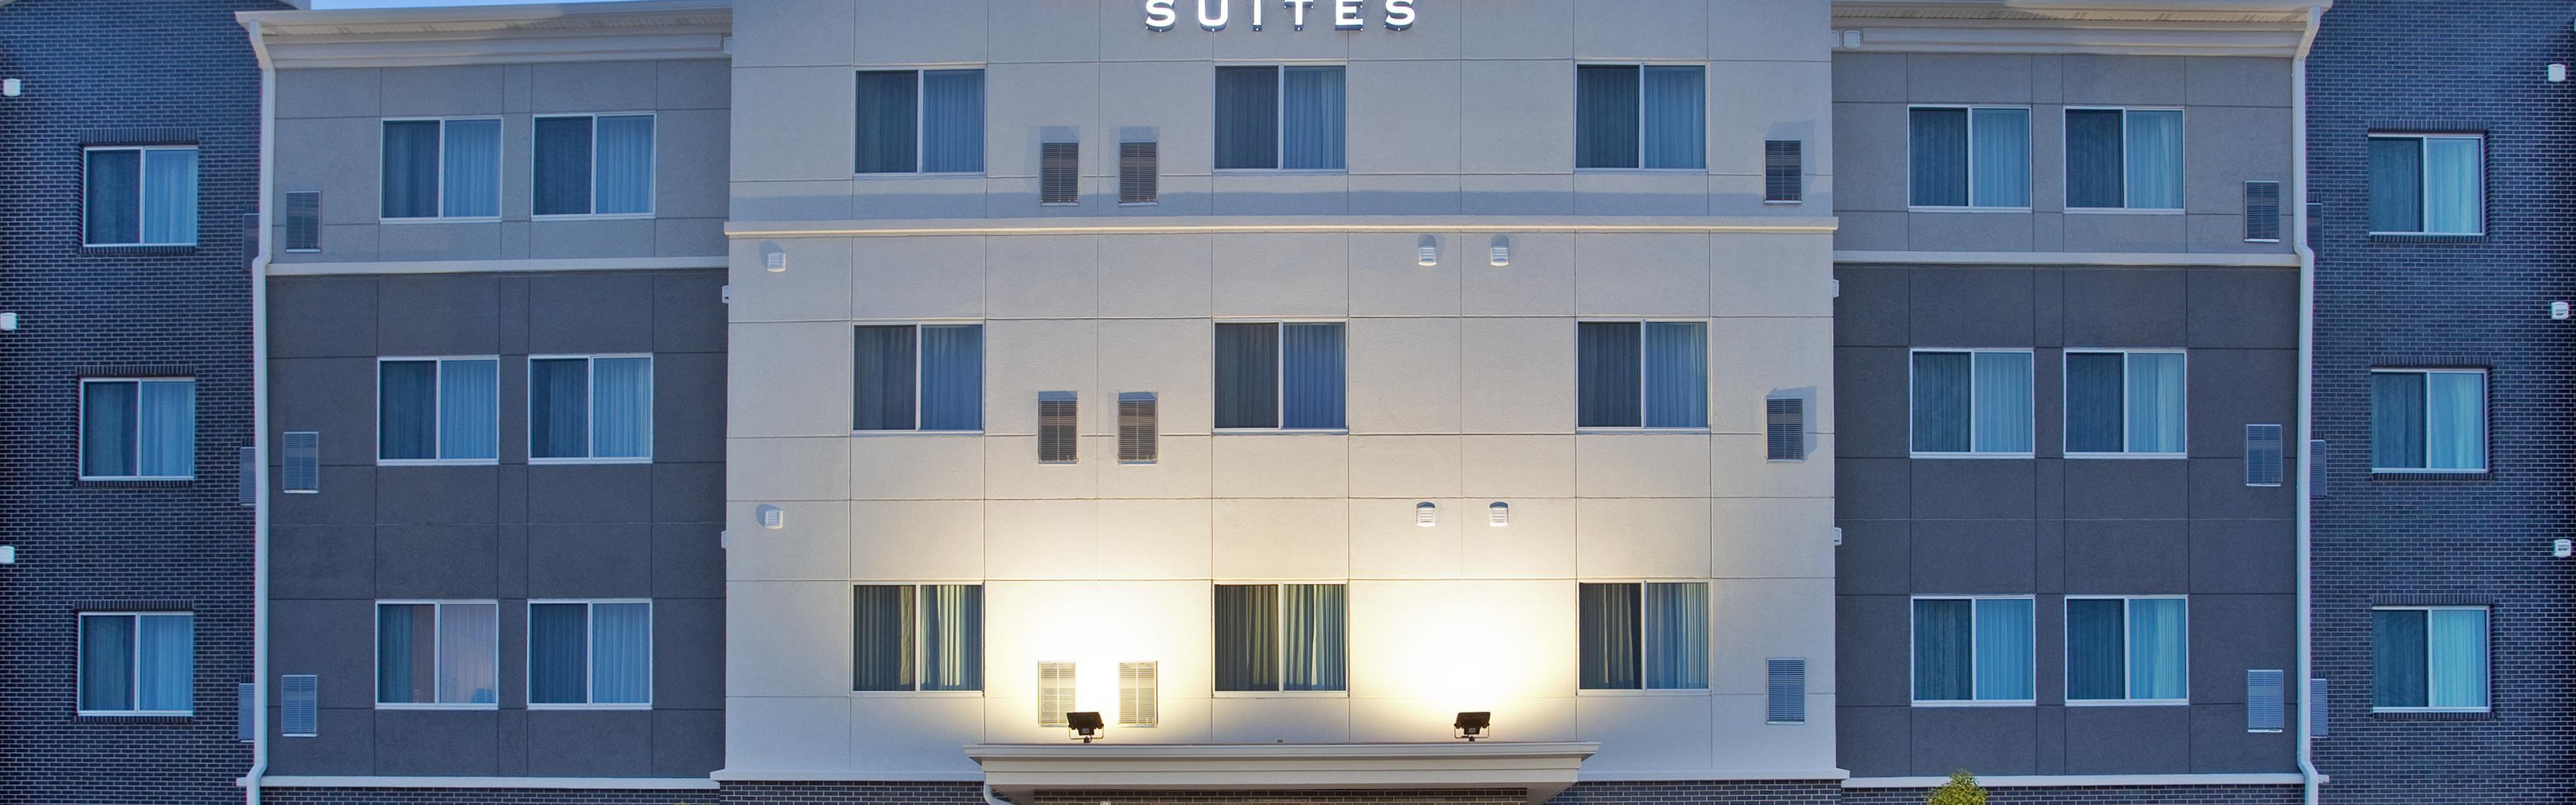 Candlewood Suites Kearney image 0